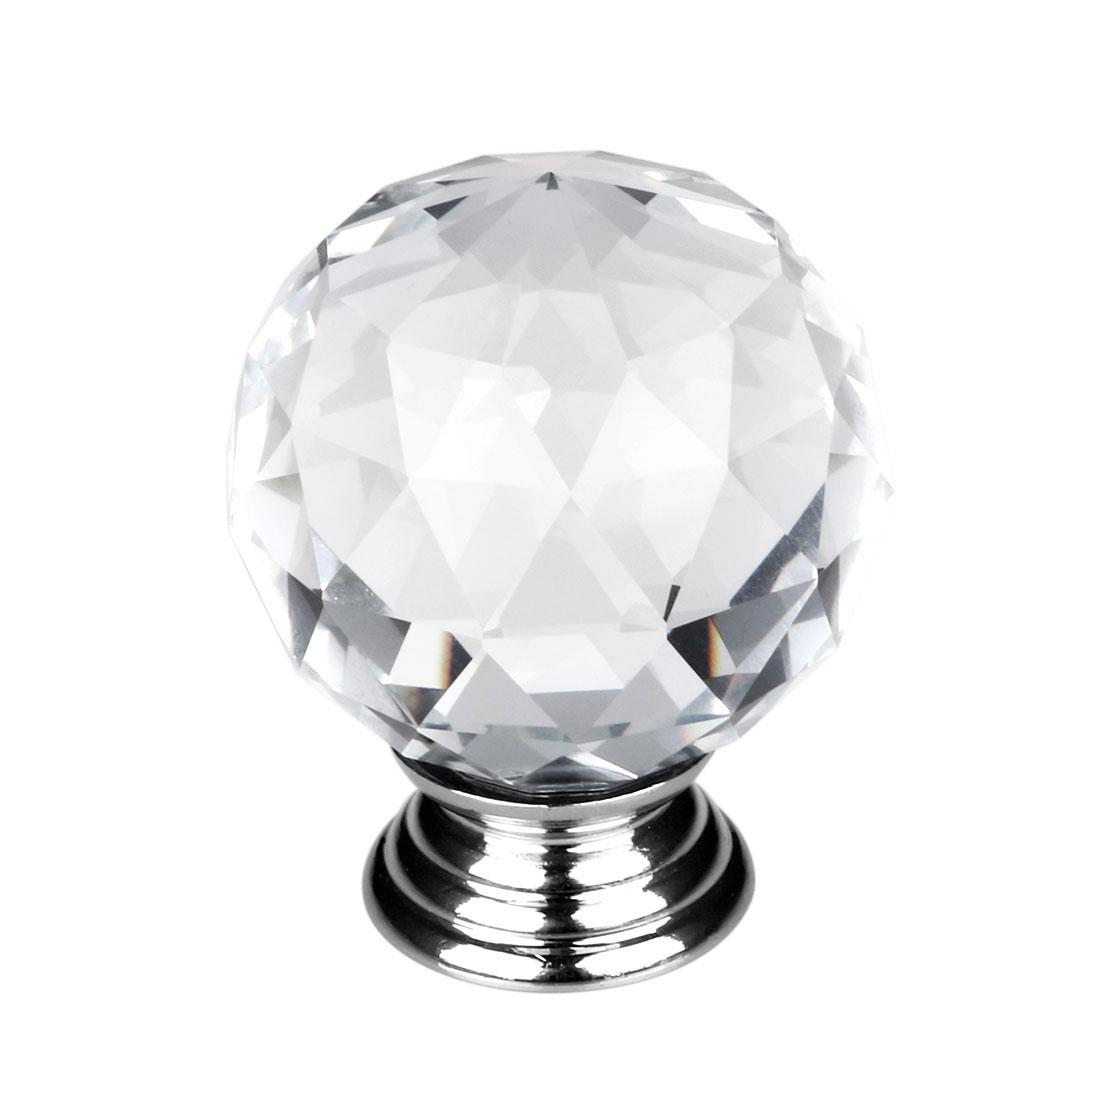 Clear Round Crystal Glass Door Knobs Cupboard Drawer Cabinet Kitchen Handles 1Pc